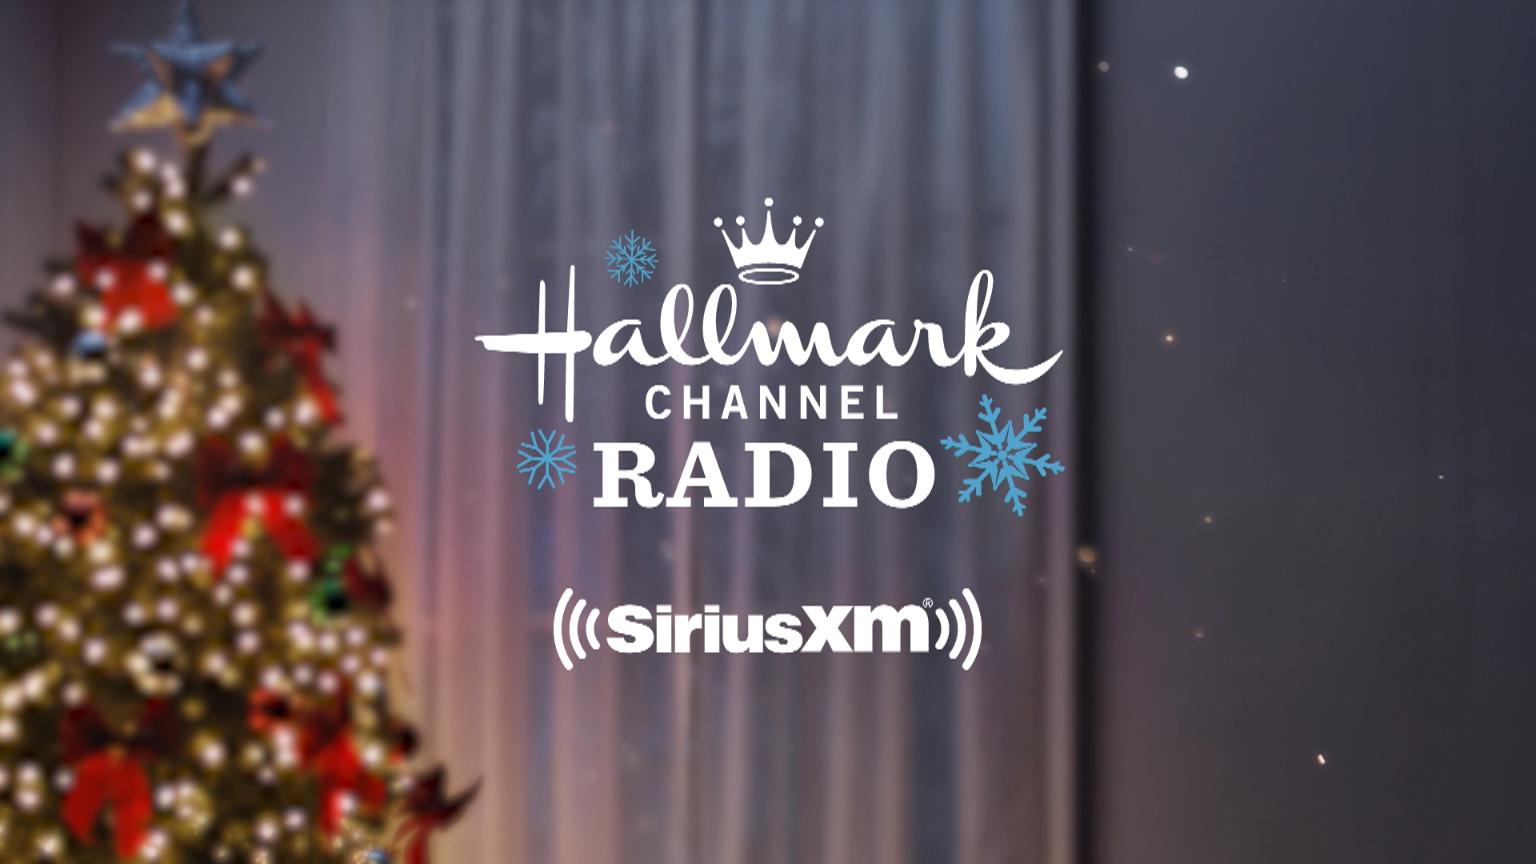 Siriusxm Christmas Music.Tune Into Hallmark Channel Radio On Siriusxm Channel 70 To